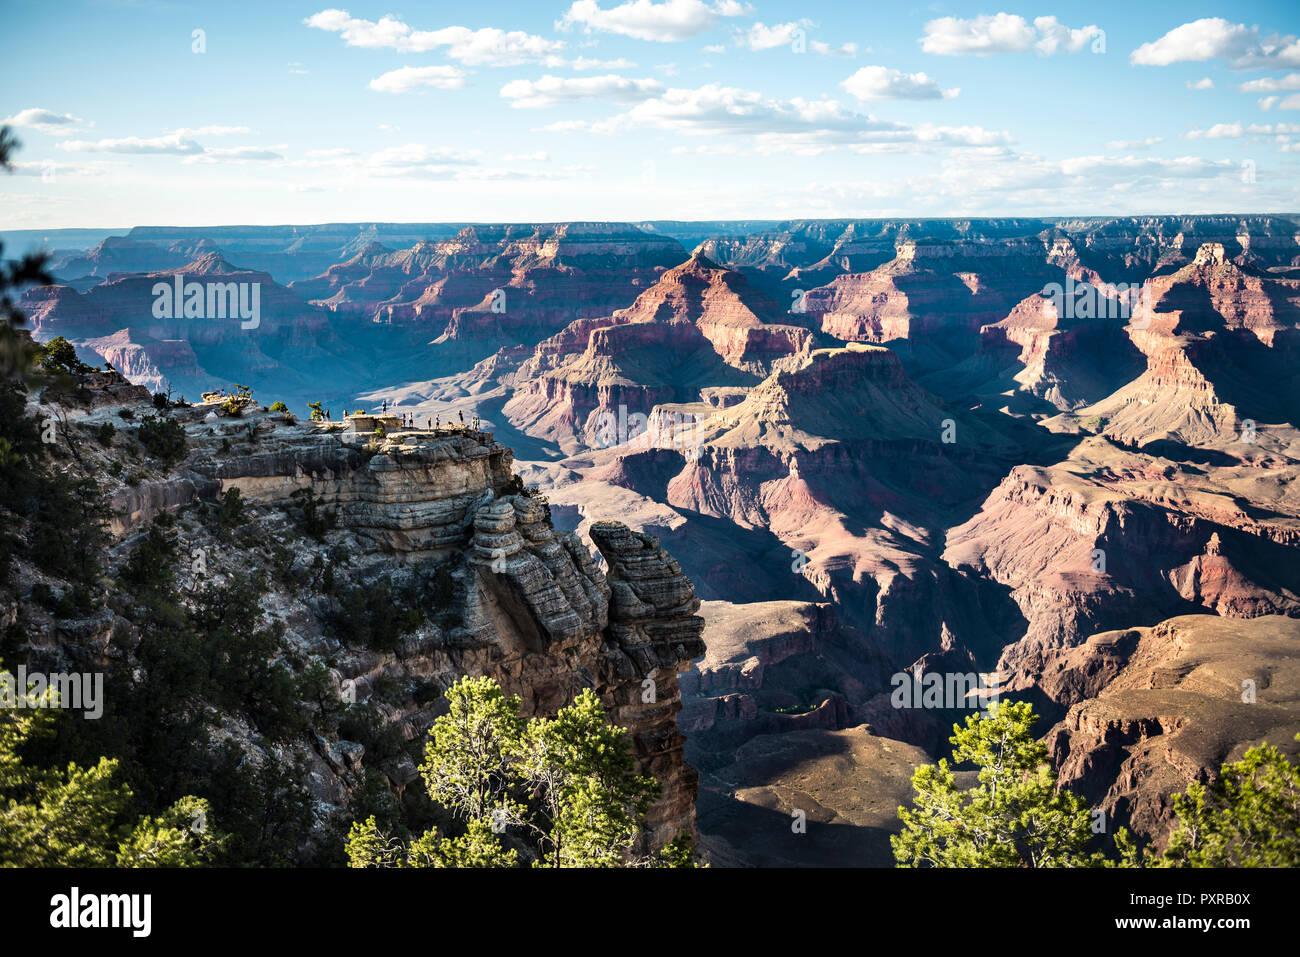 USA, Arizona, Grand Canyon National Park, Grand Canyon, people on viewpoint - Stock Image